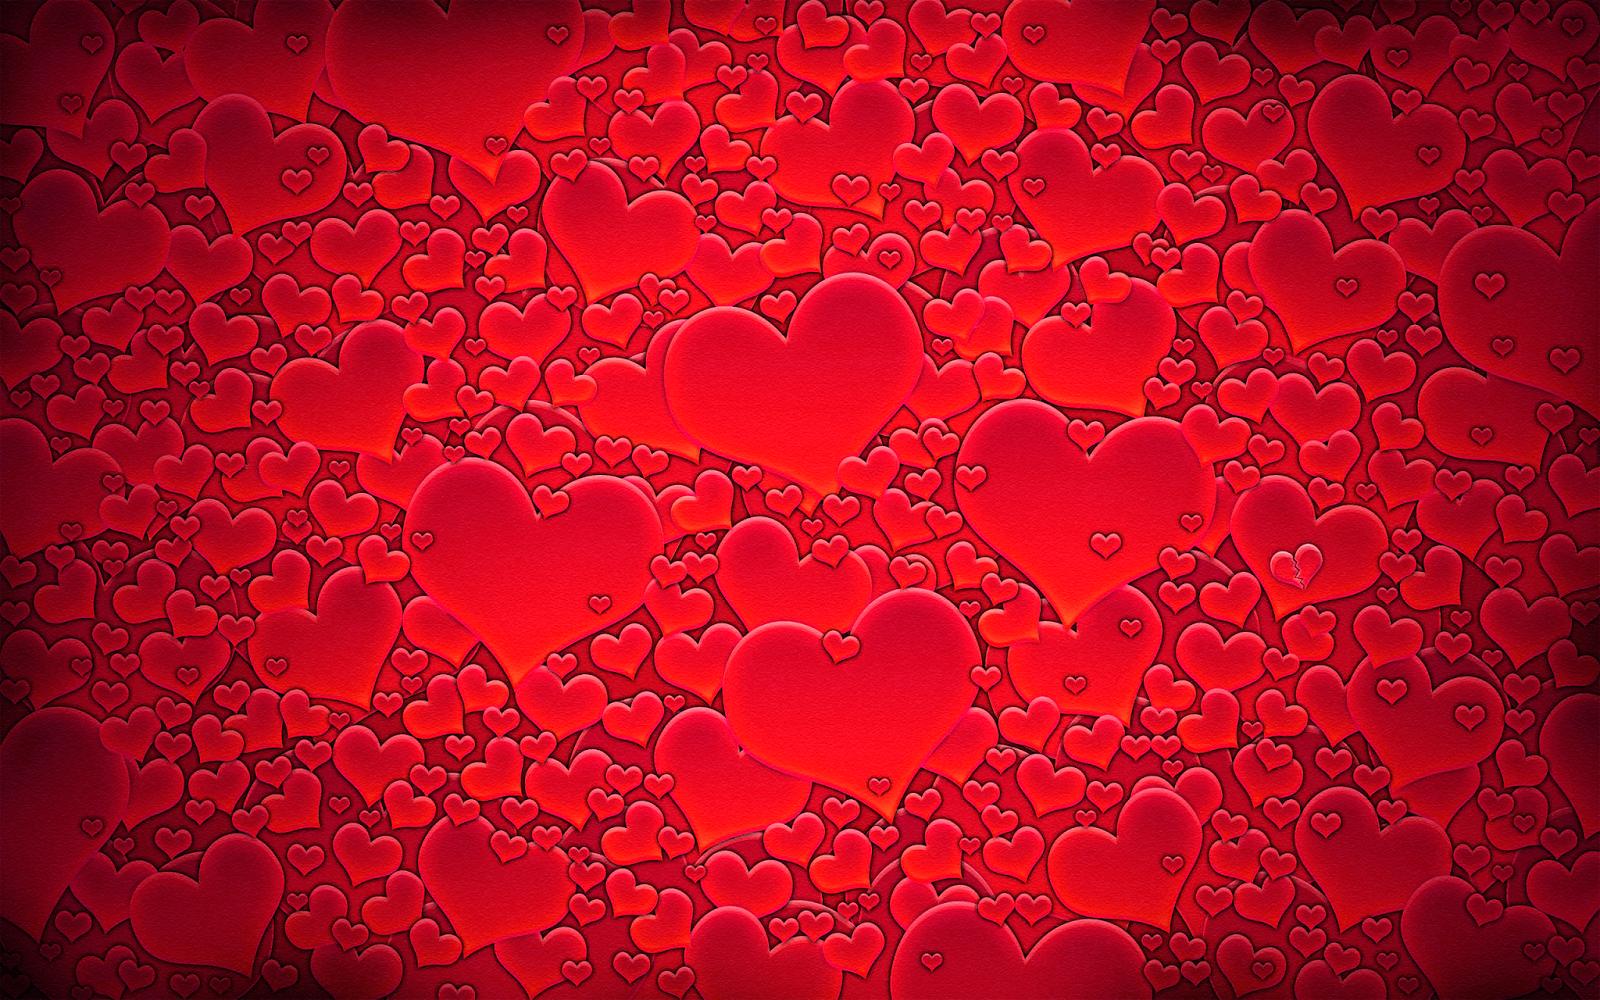 Fondos De Pantalla Gratis San Valentin 16: ® Gifs Y Fondos Paz Enla Tormenta ®: FONDOS DE PANTALLA